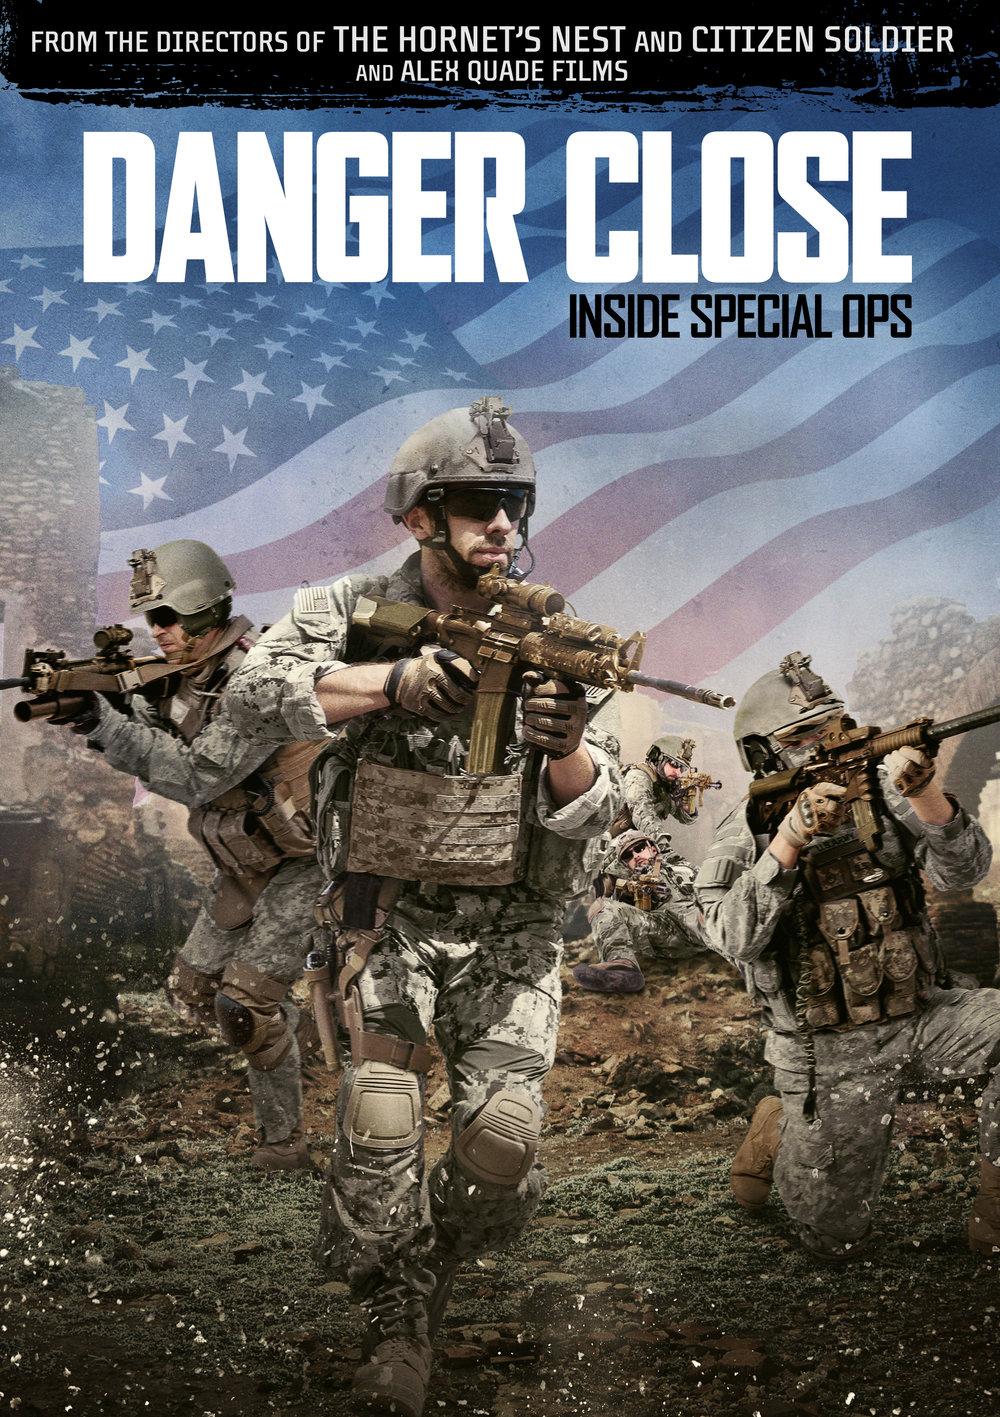 DangerClose_KeyArt_V2.jpg